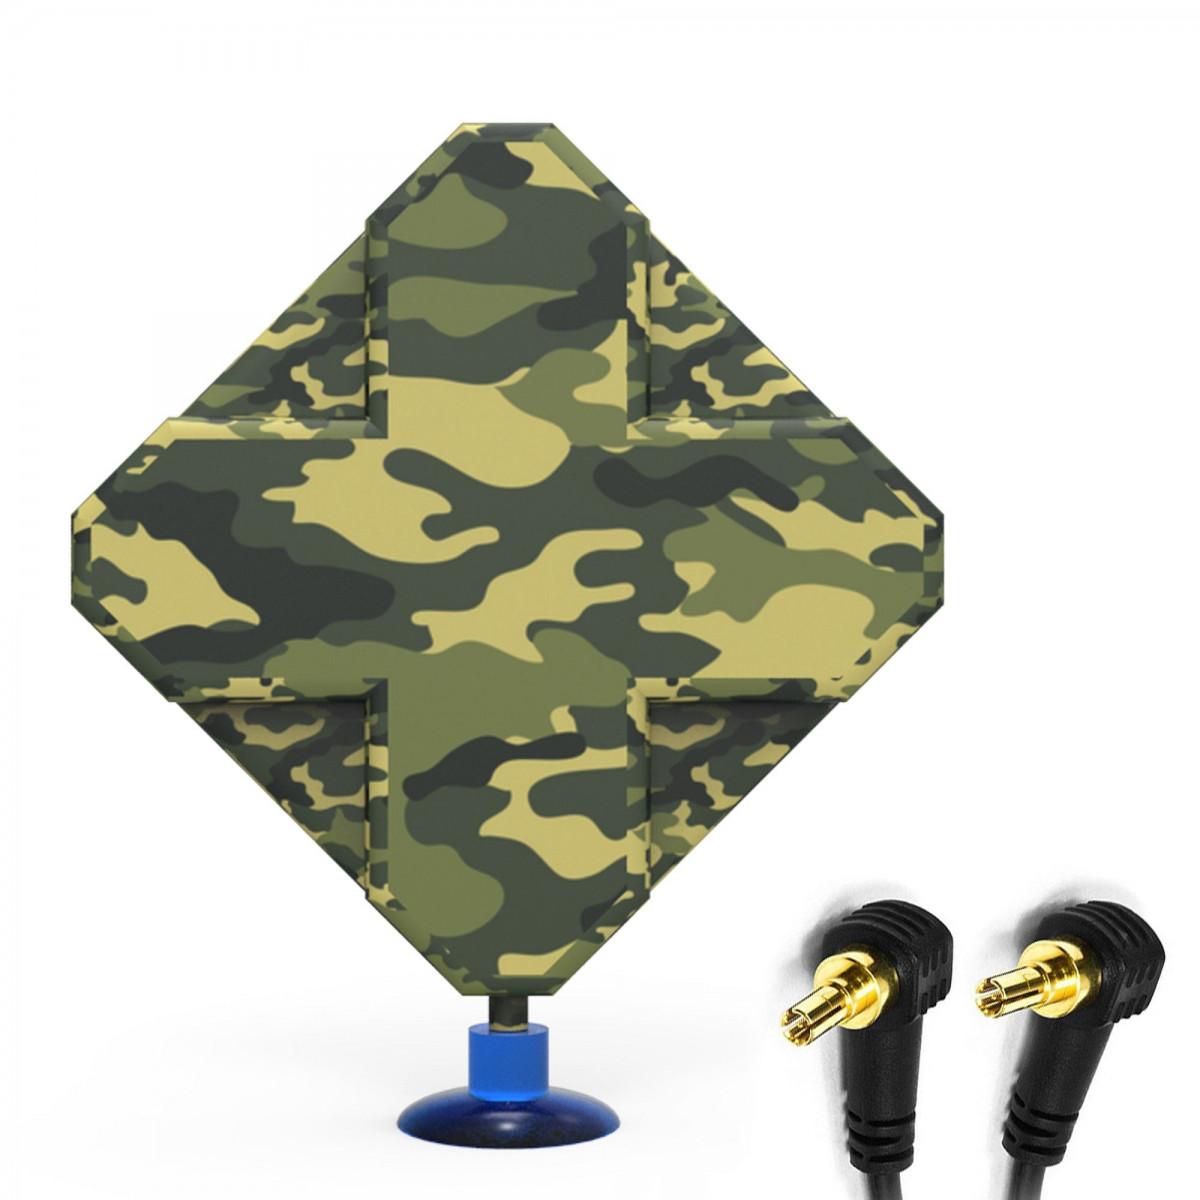 Antena 4G LTE DUAL X-CROSS MILITARY 44dbi 2x5m 2xcrc9